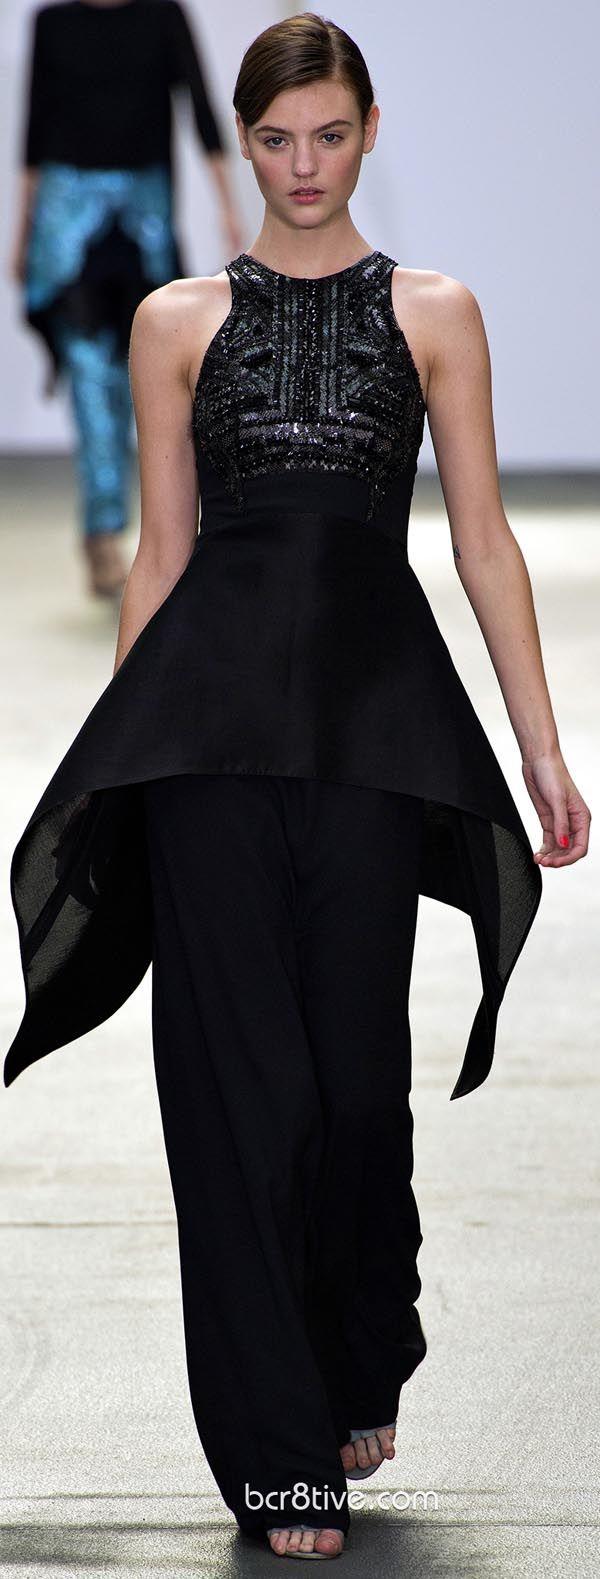 Antonio Berardi Spring Summer 2013 Ready To Wear Collection